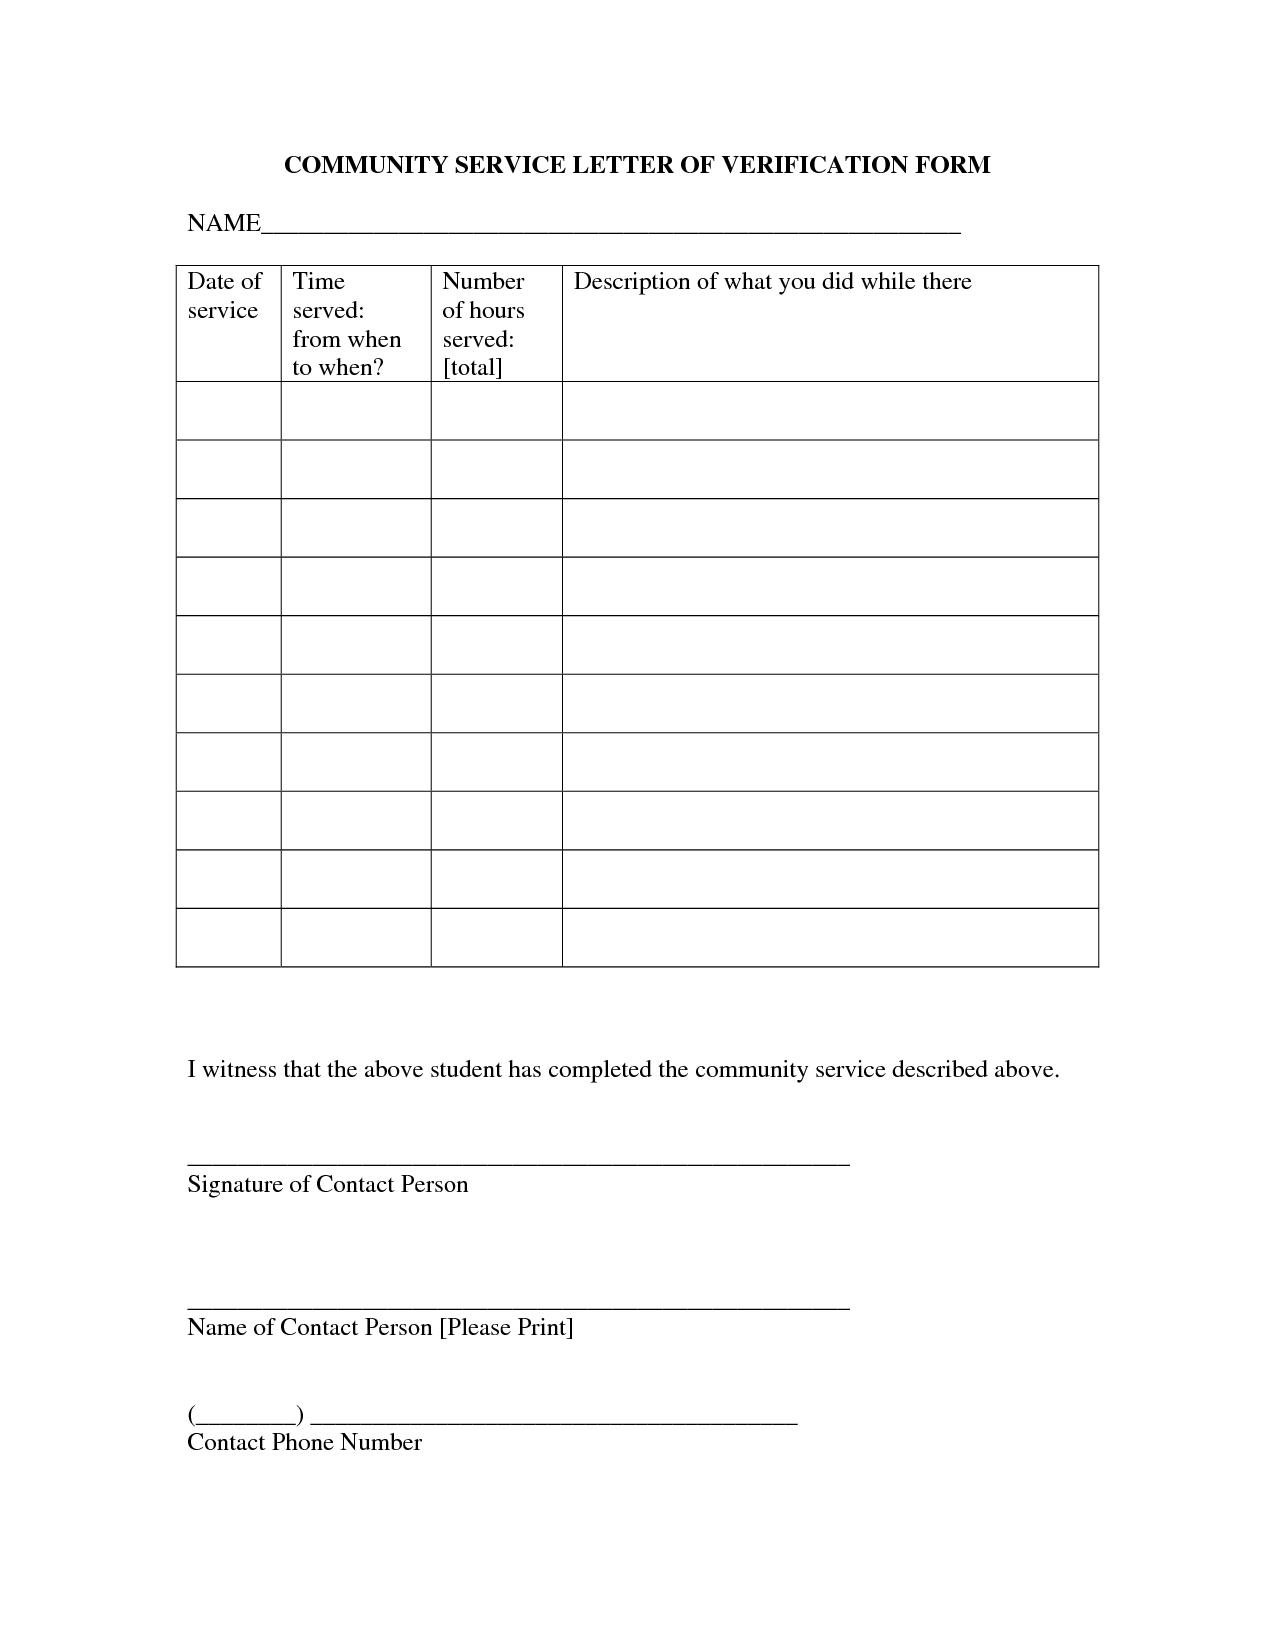 Community Service Form Template